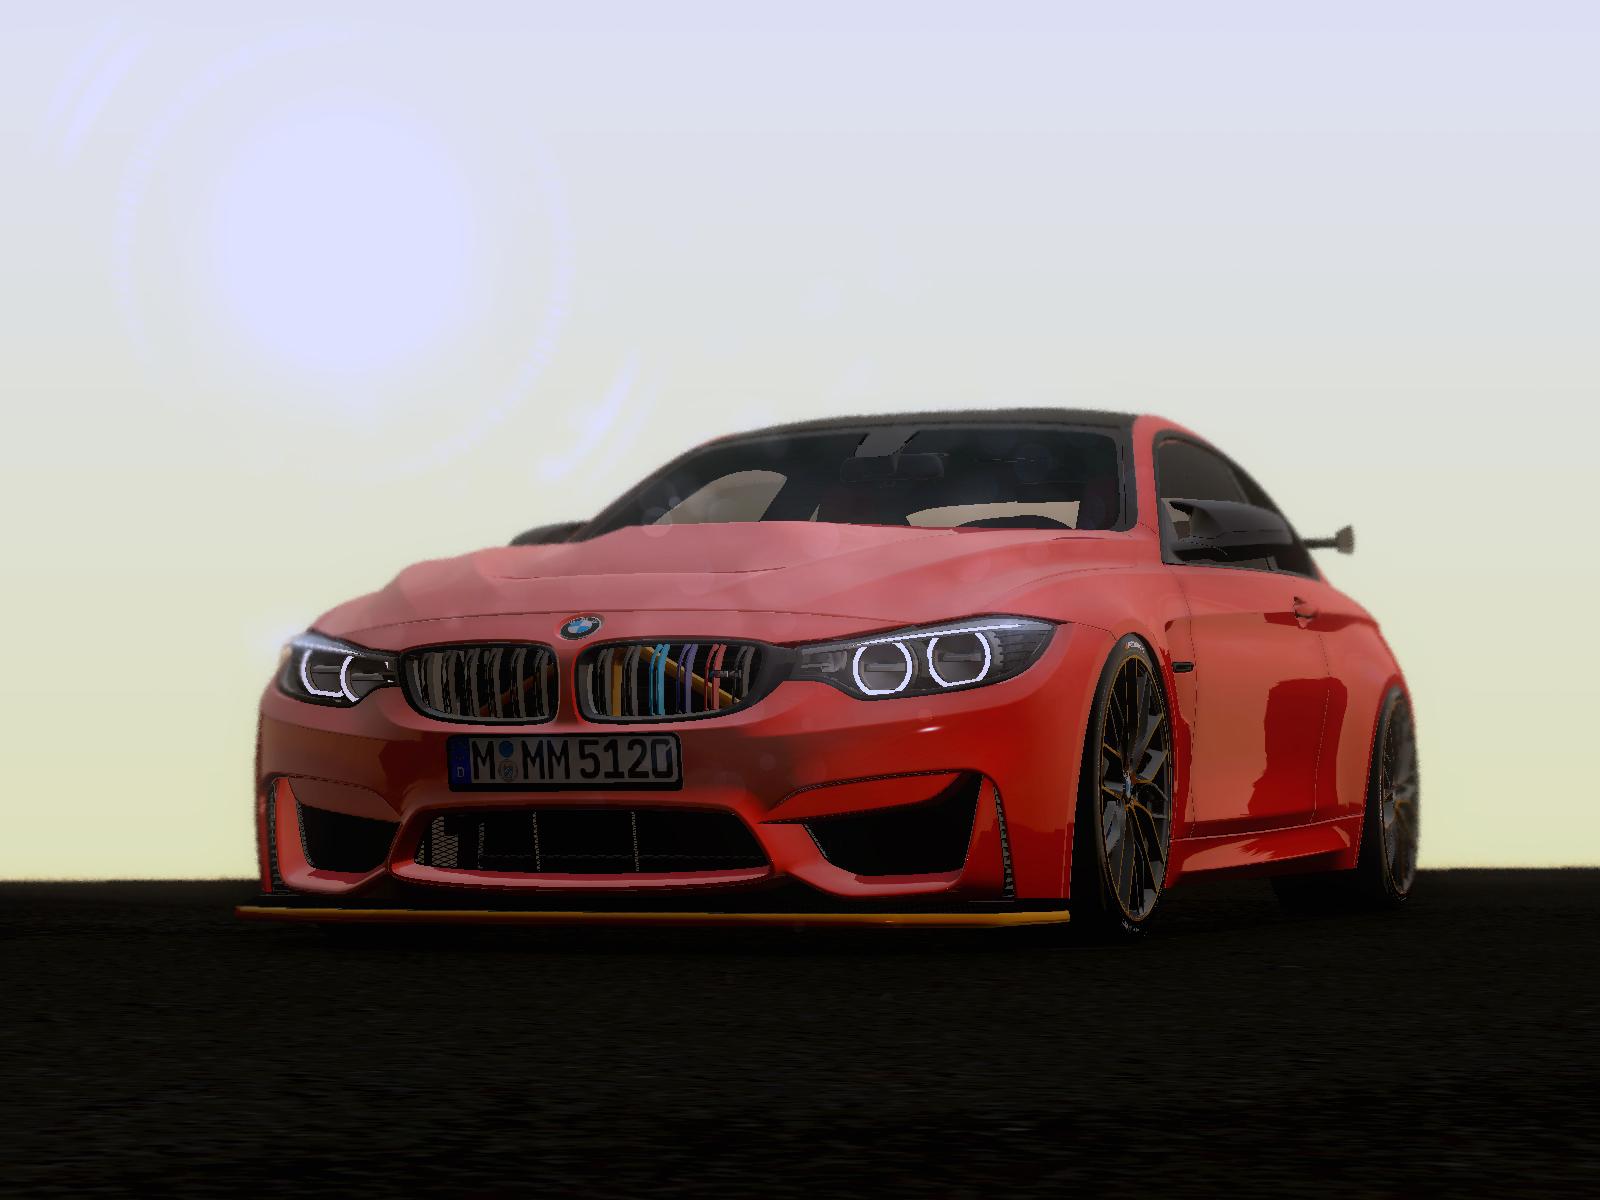 K g modding team ff ultimate for Garage bmw horizon